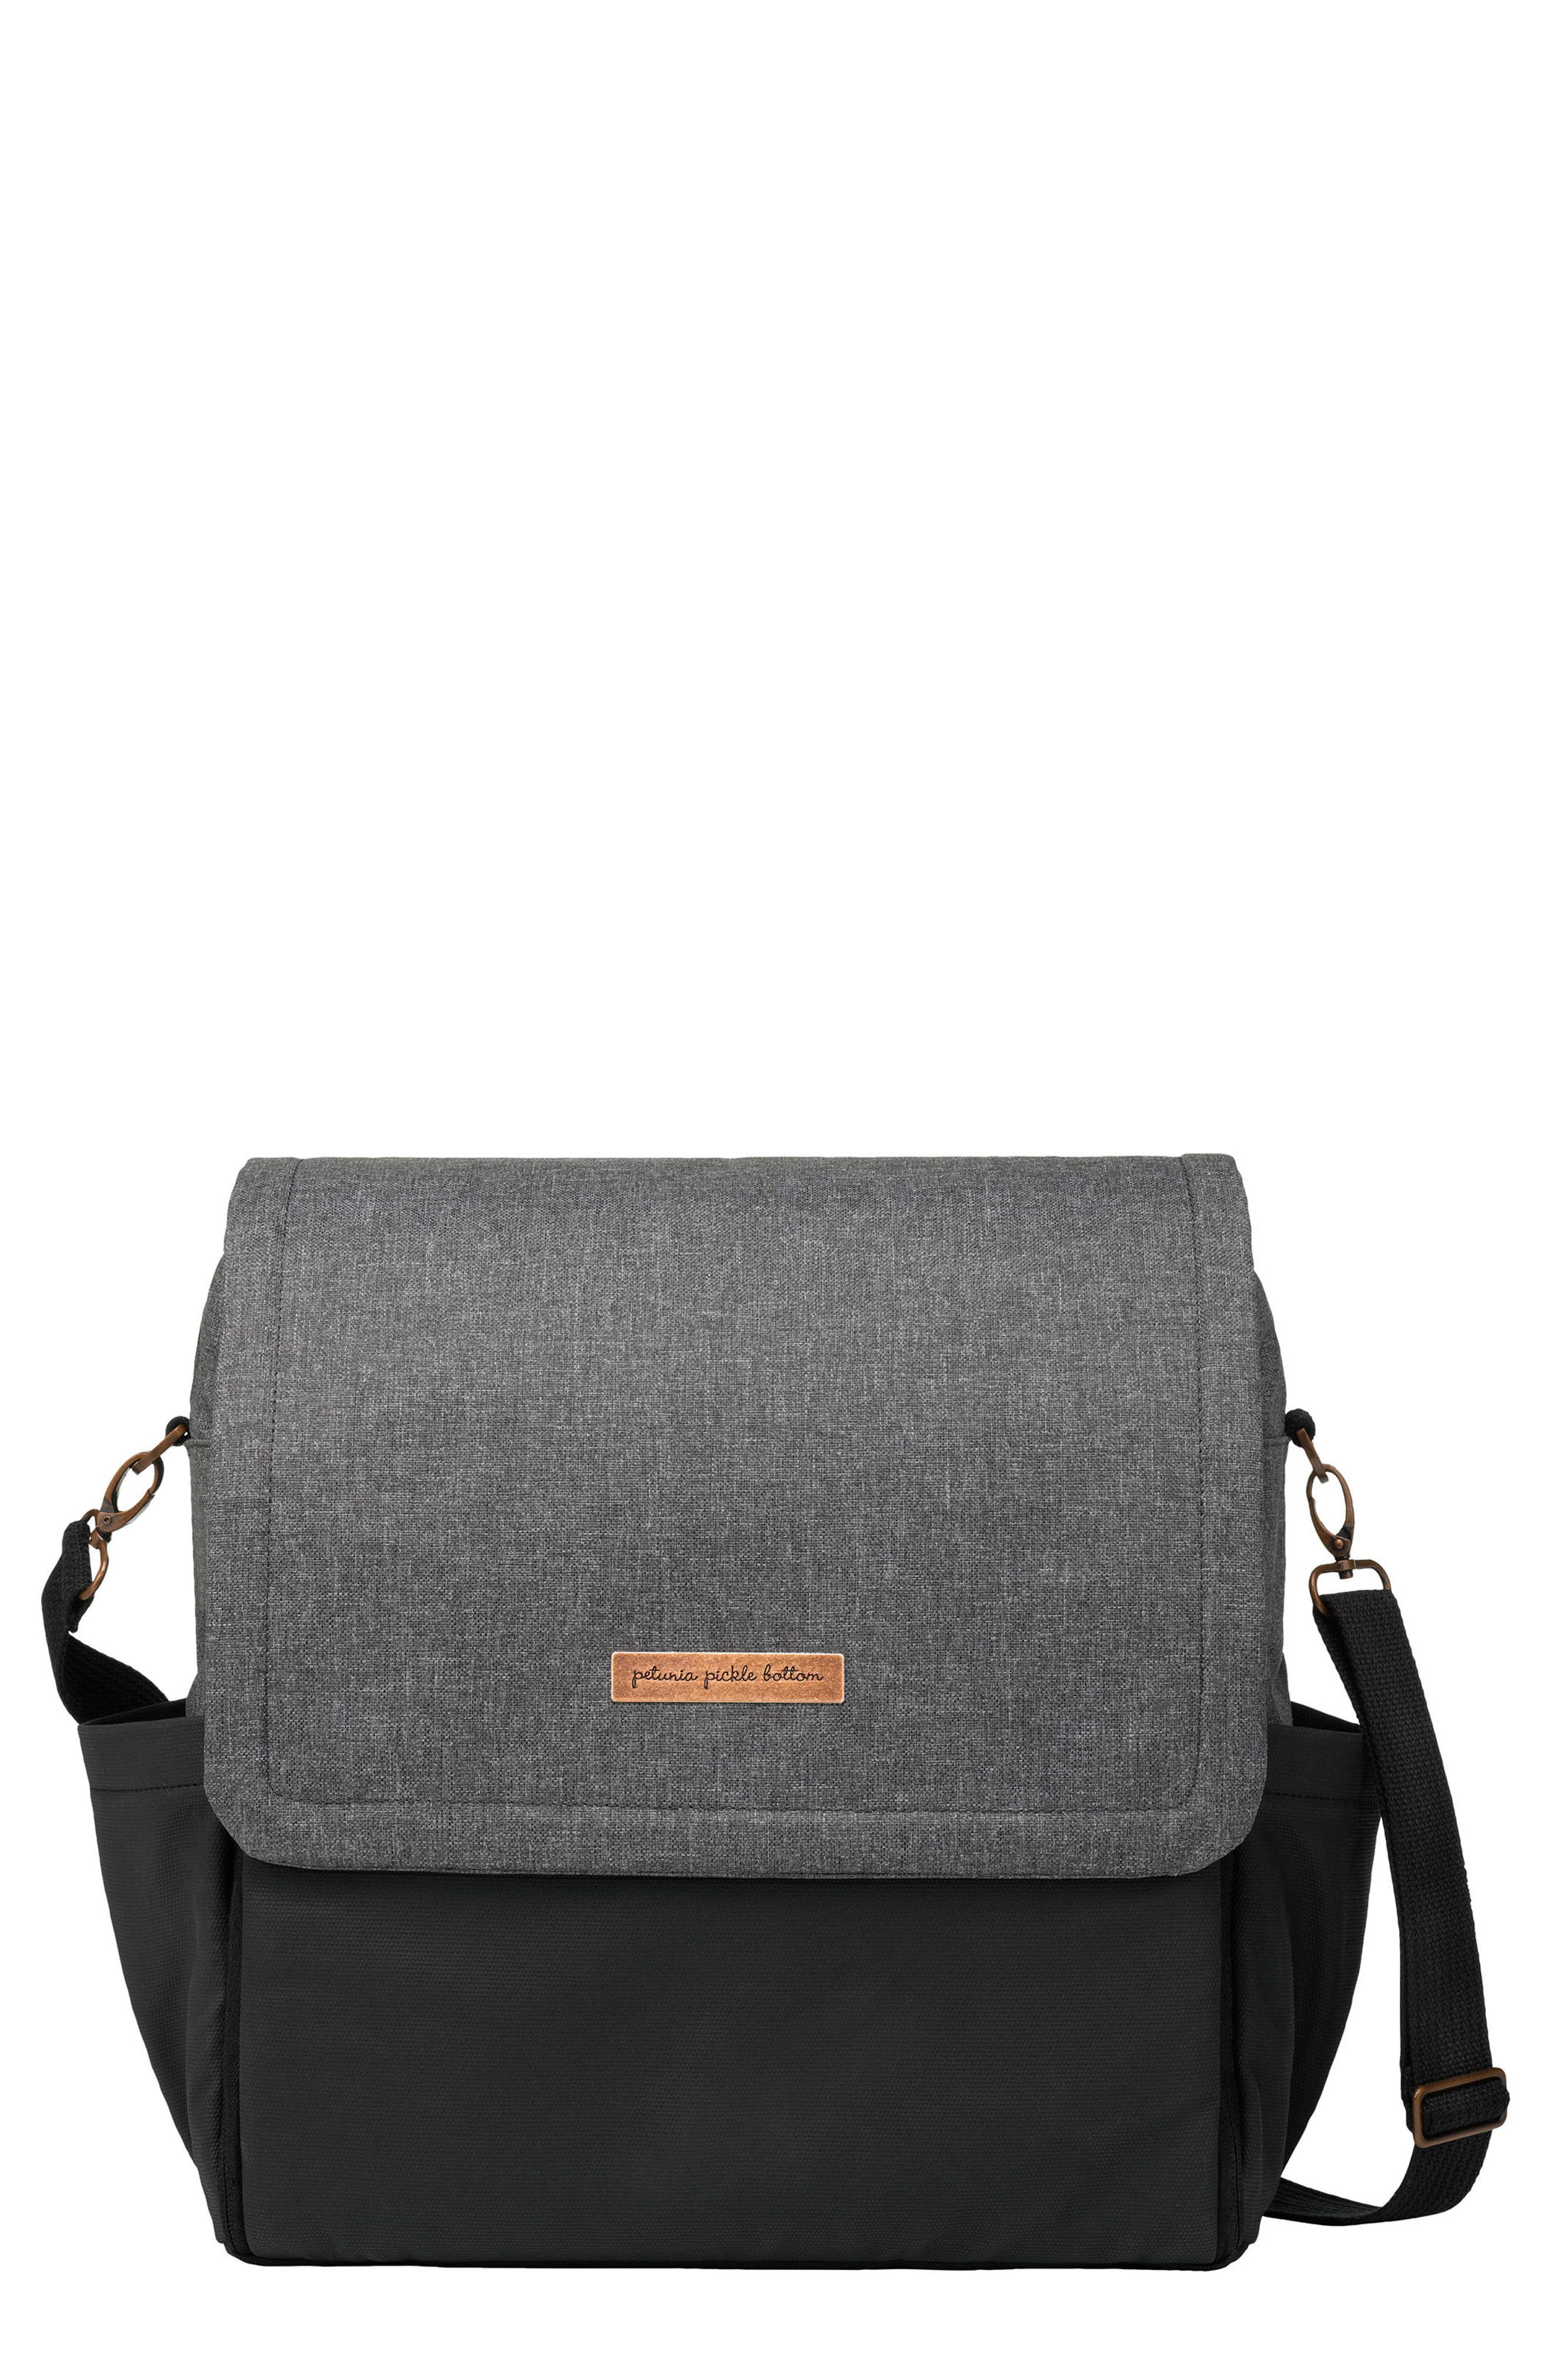 Boxy Backpack Diaper Bag,                             Main thumbnail 1, color,                             GRAPHITE/ BLACK